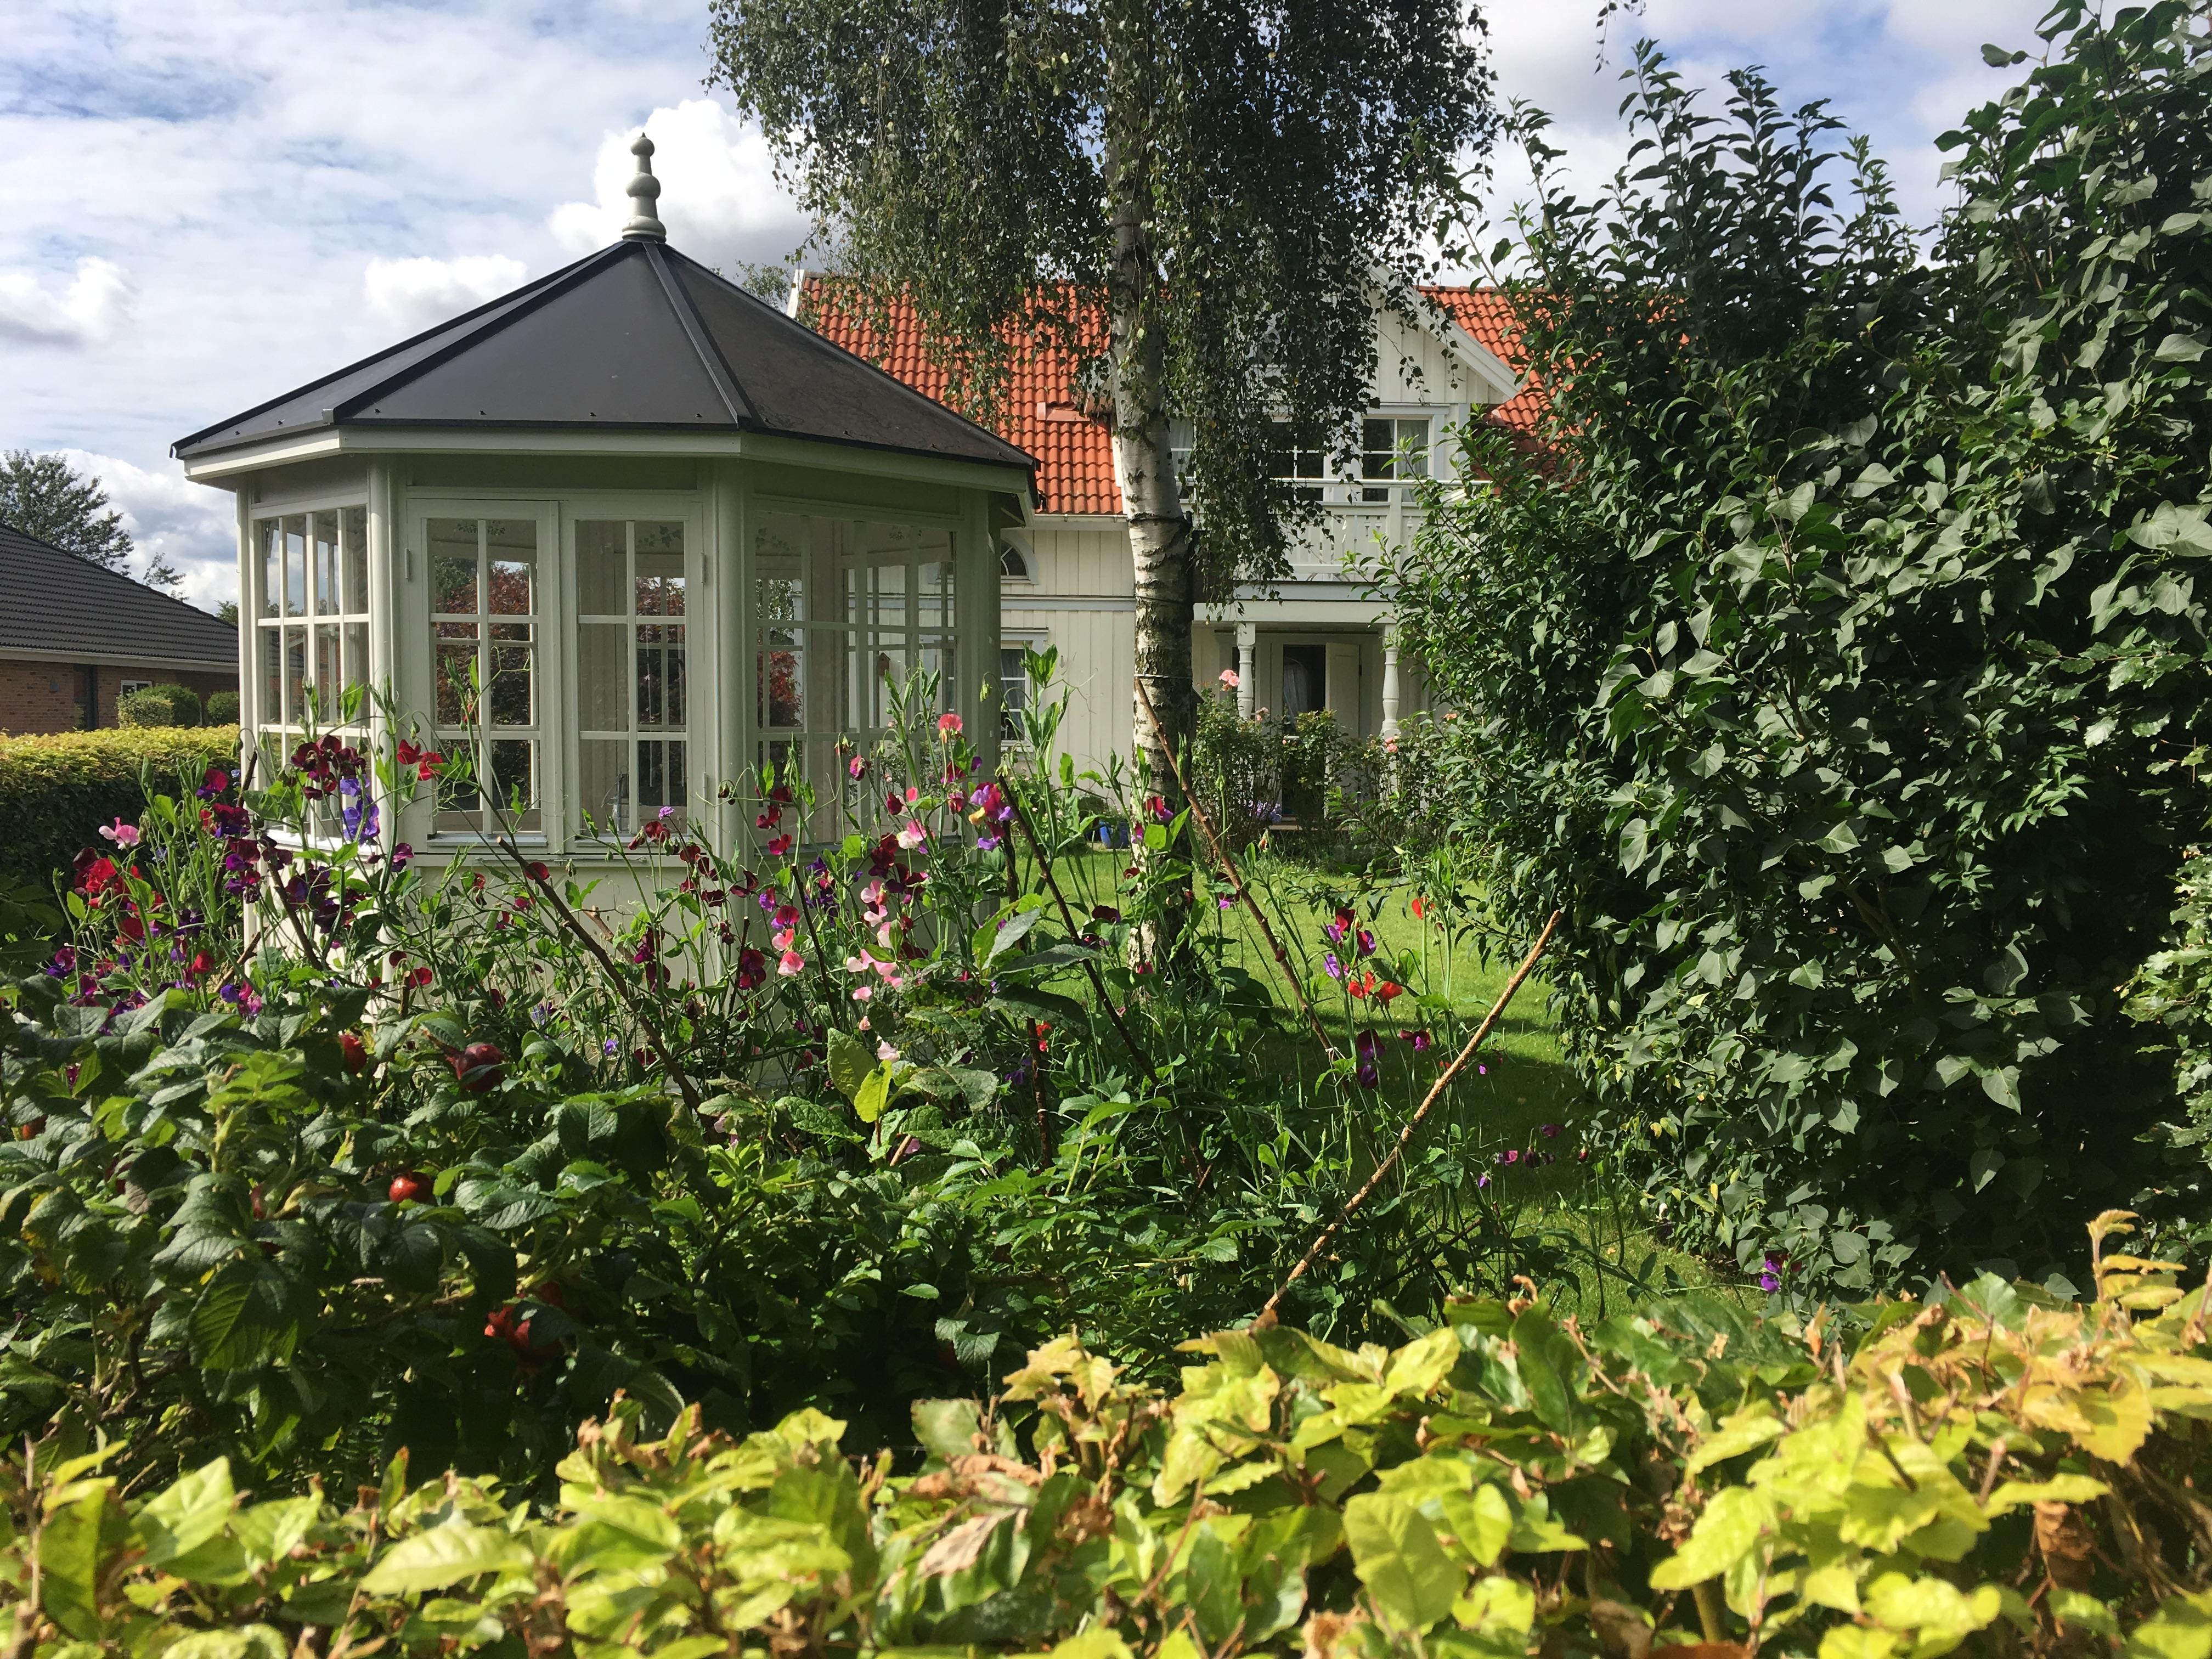 Latyrus i haven